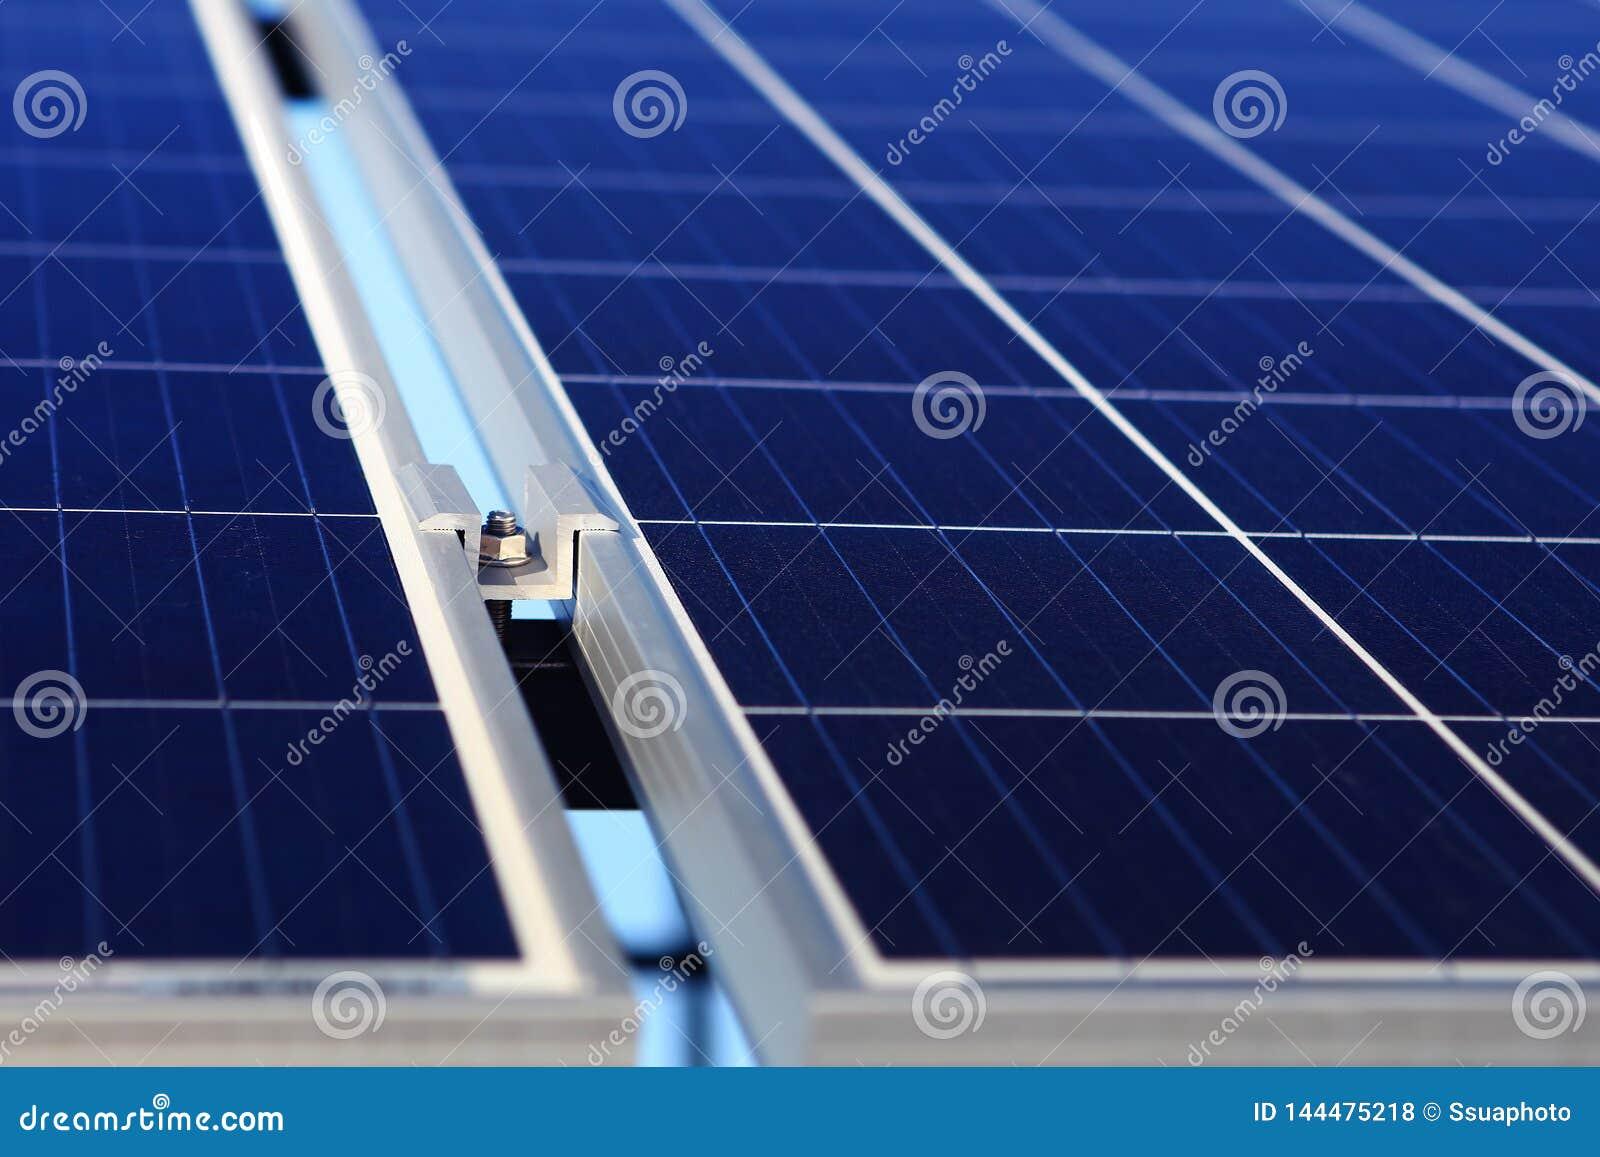 Background of alternative solar energy